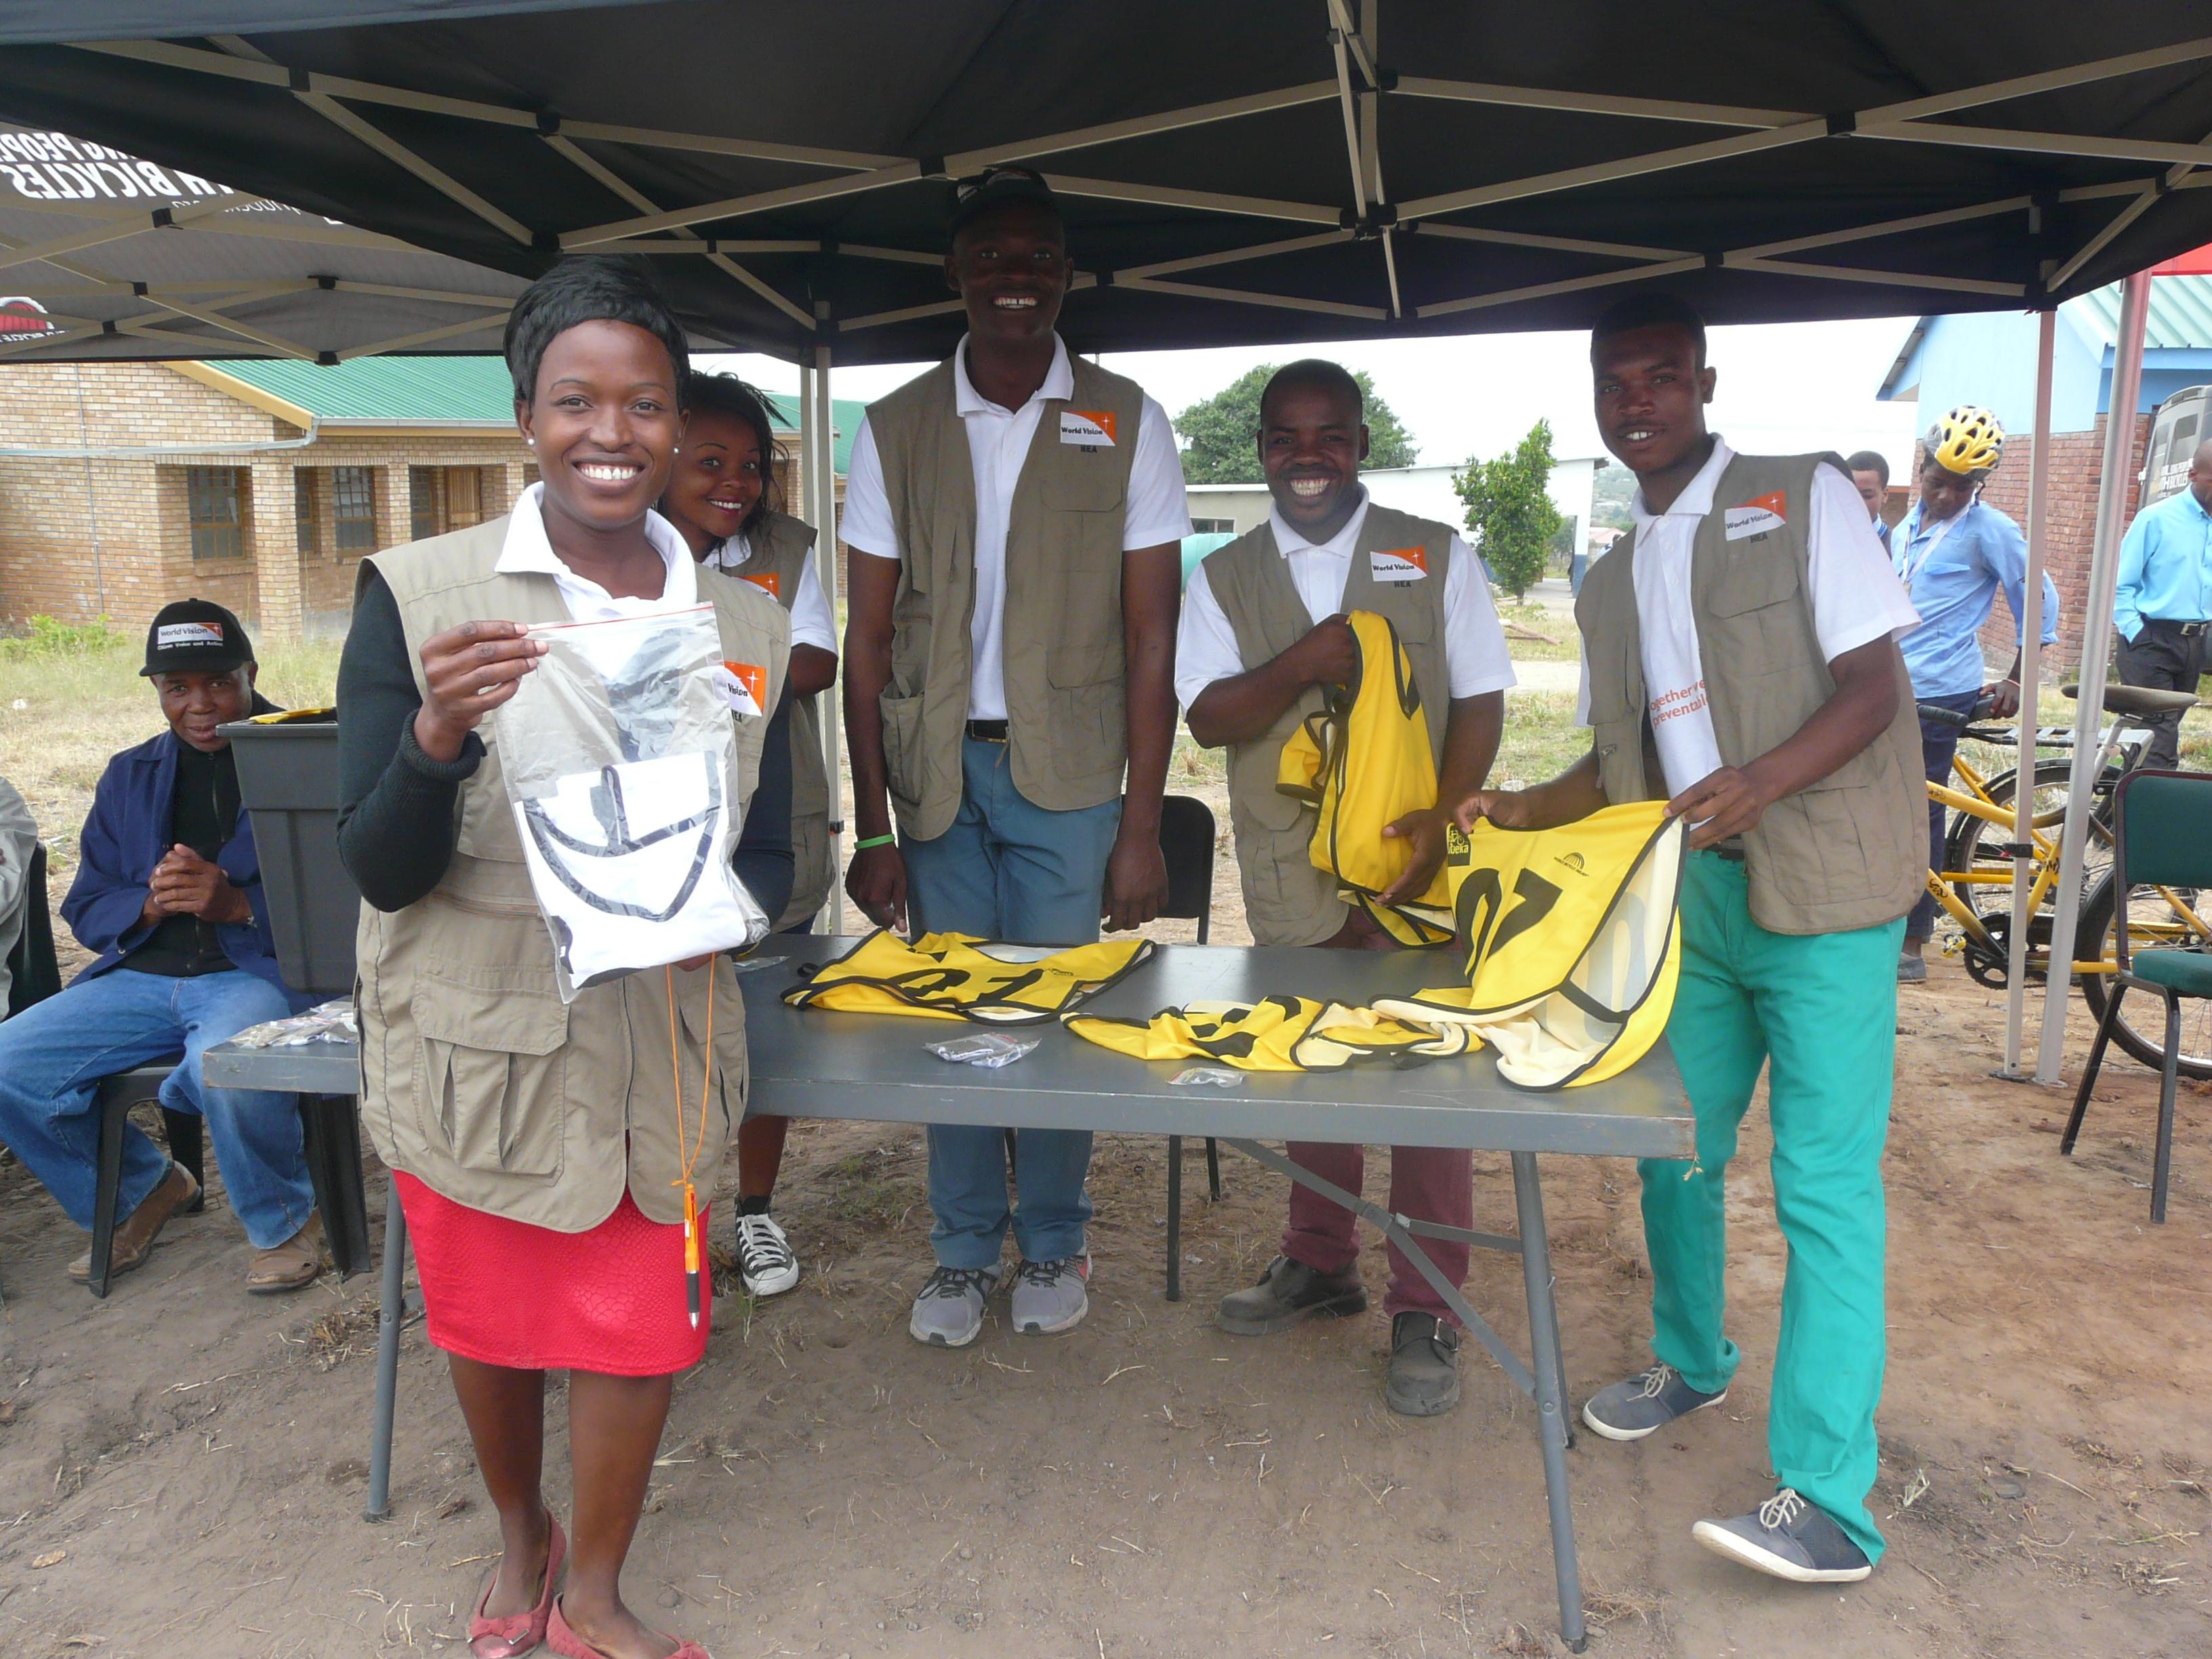 Team World Vision, CSA Community Cycling Series, Limpopo